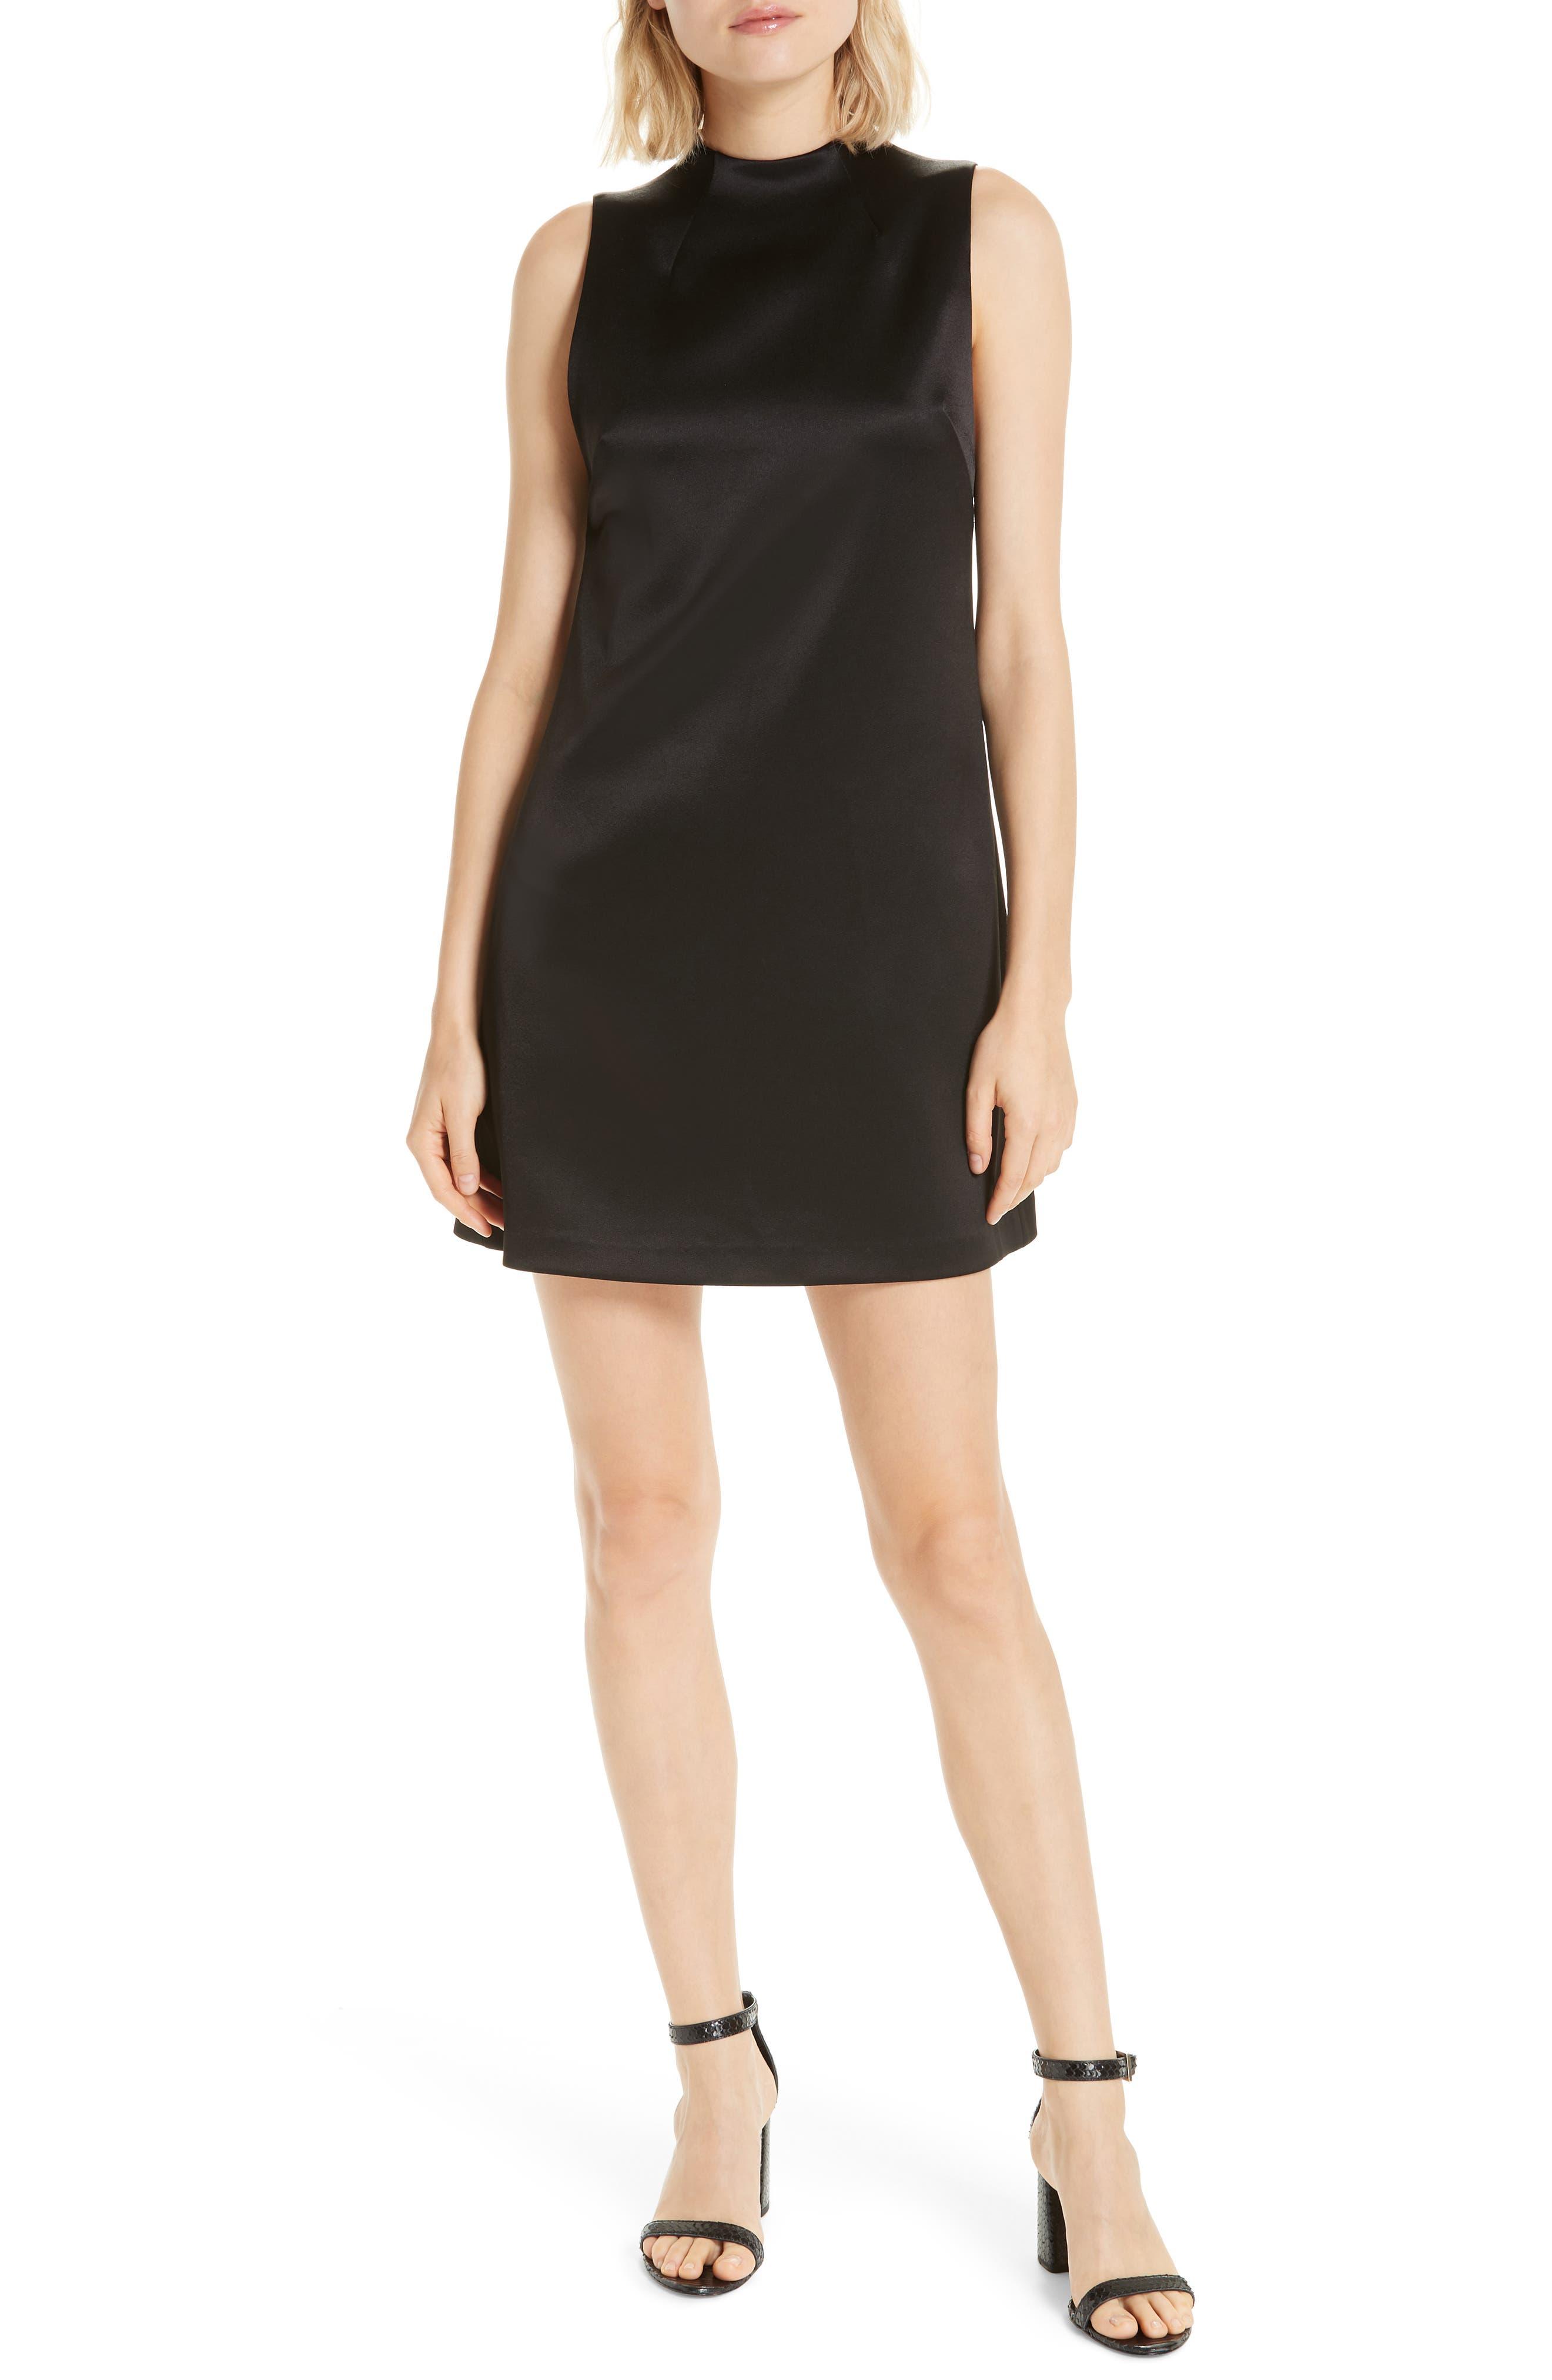 ALICE + OLIVIA,                             Coley A-Line Shift Dress,                             Main thumbnail 1, color,                             BLACK